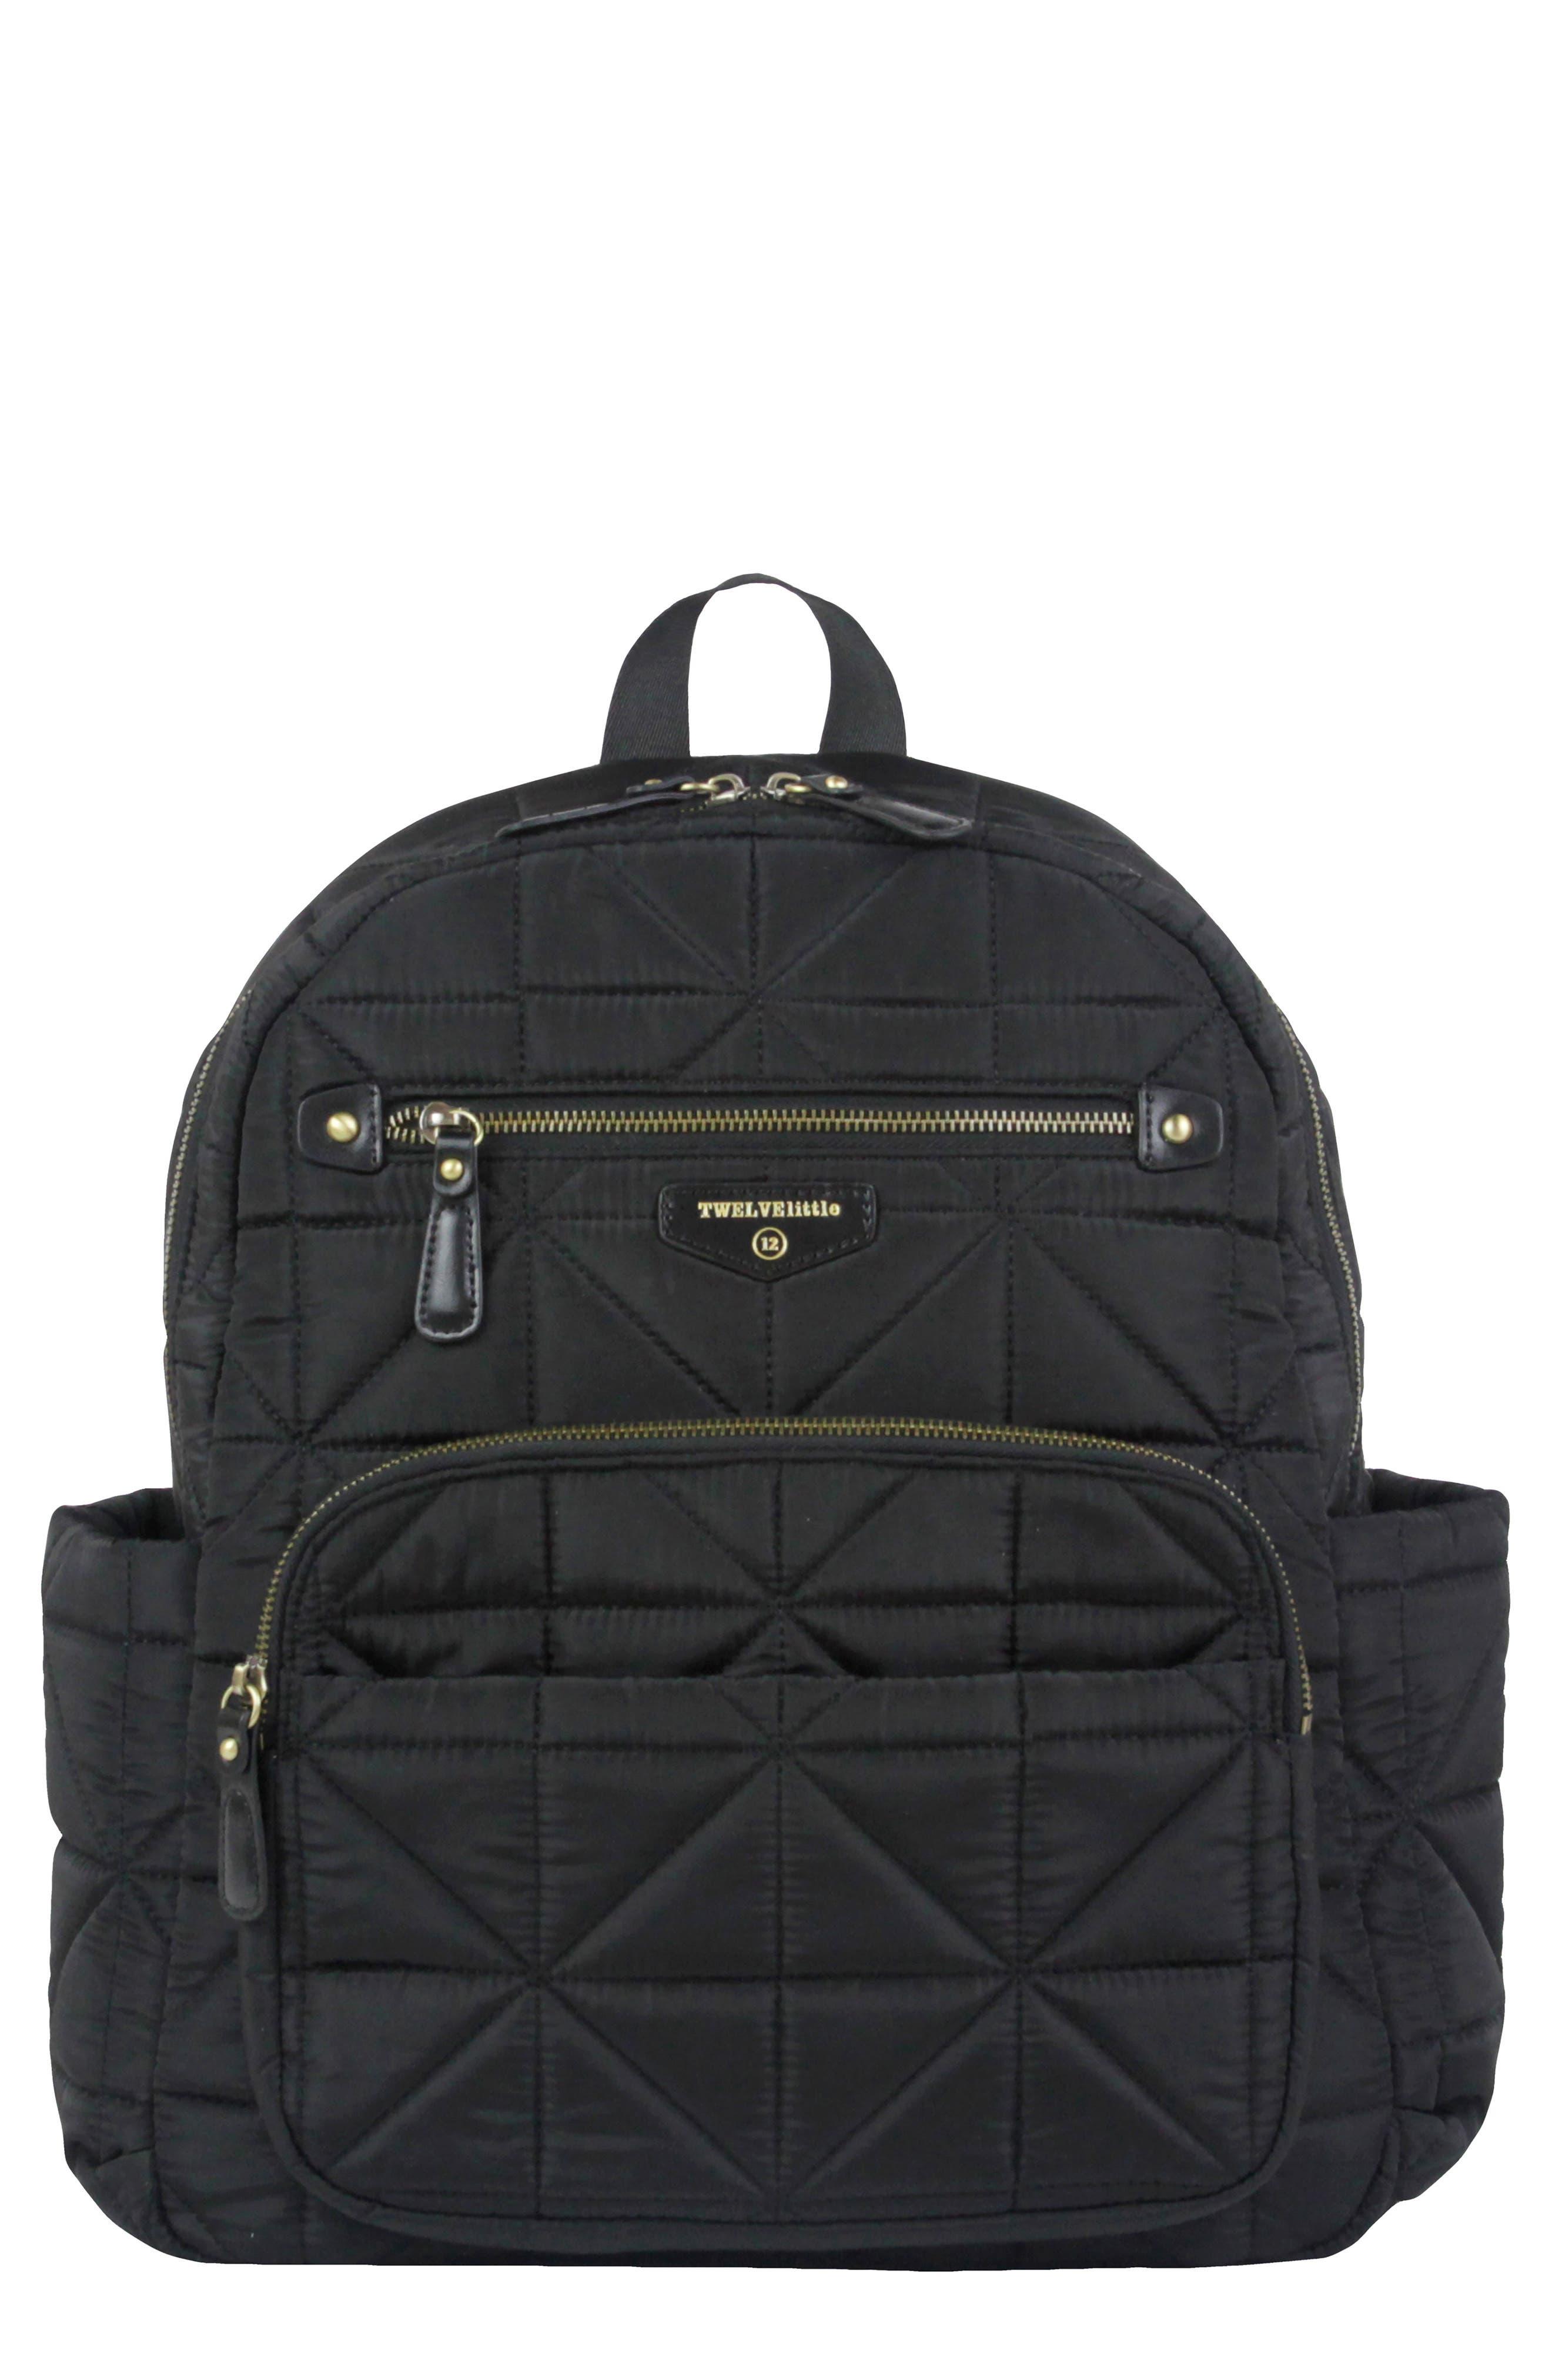 Alternate Image 1 Selected - TWELVElittle Quilted Water Resistant Nylon Diaper Backpack